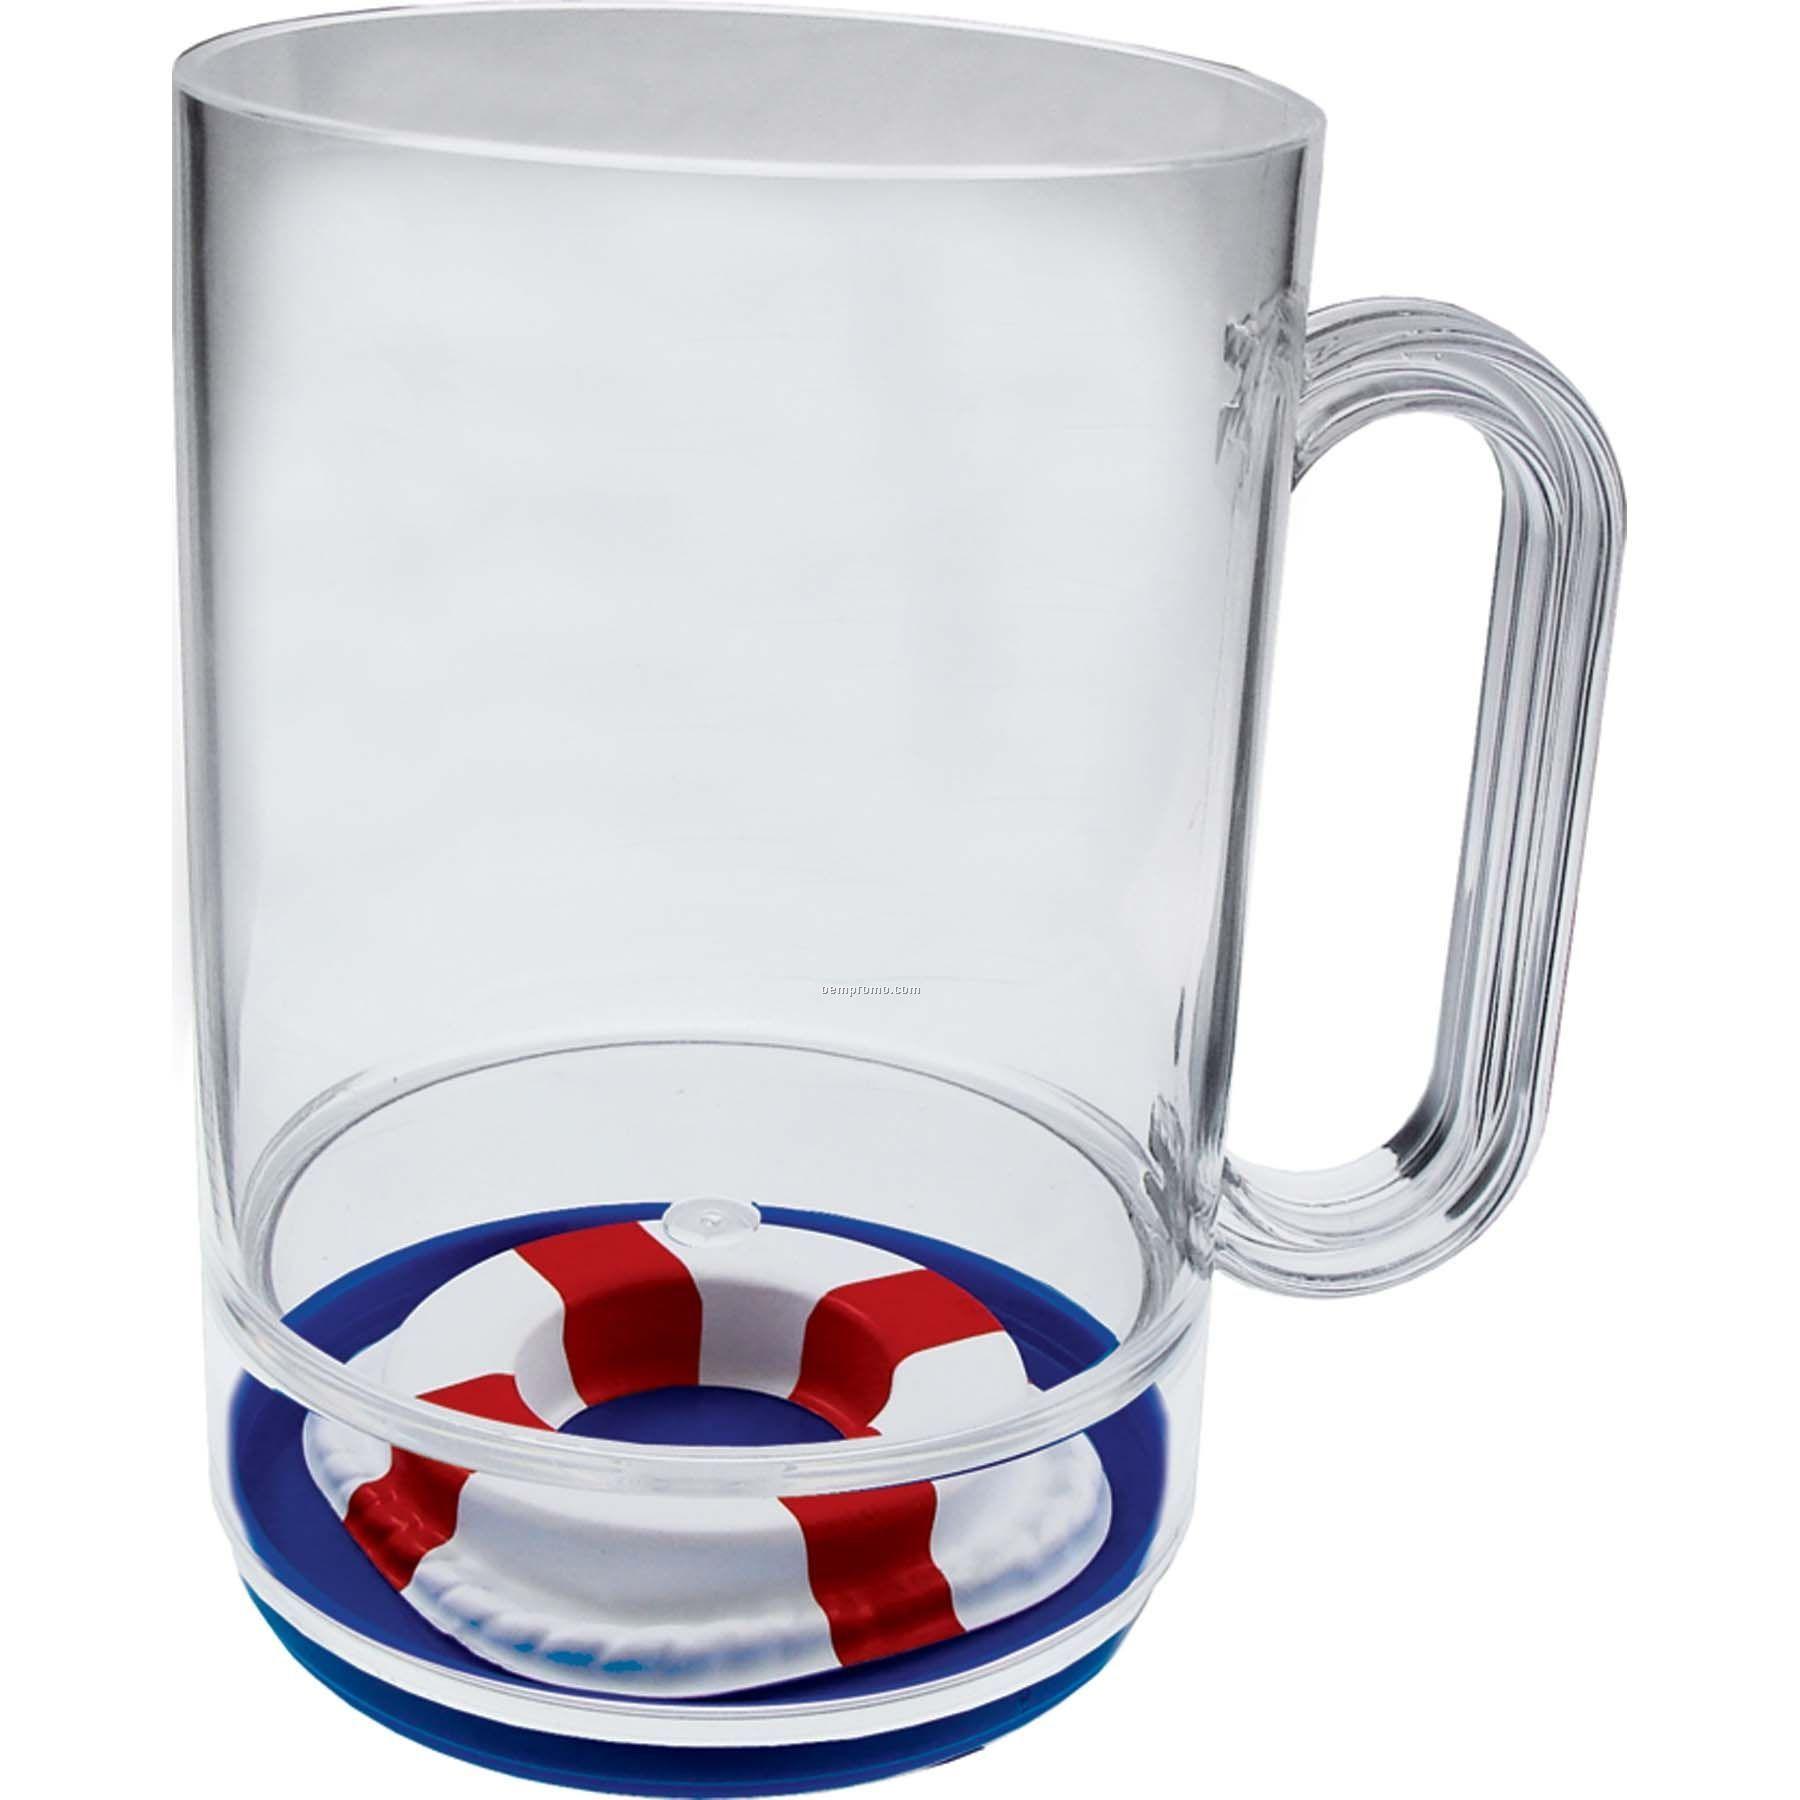 Splash 16 Oz. Compartment Mug